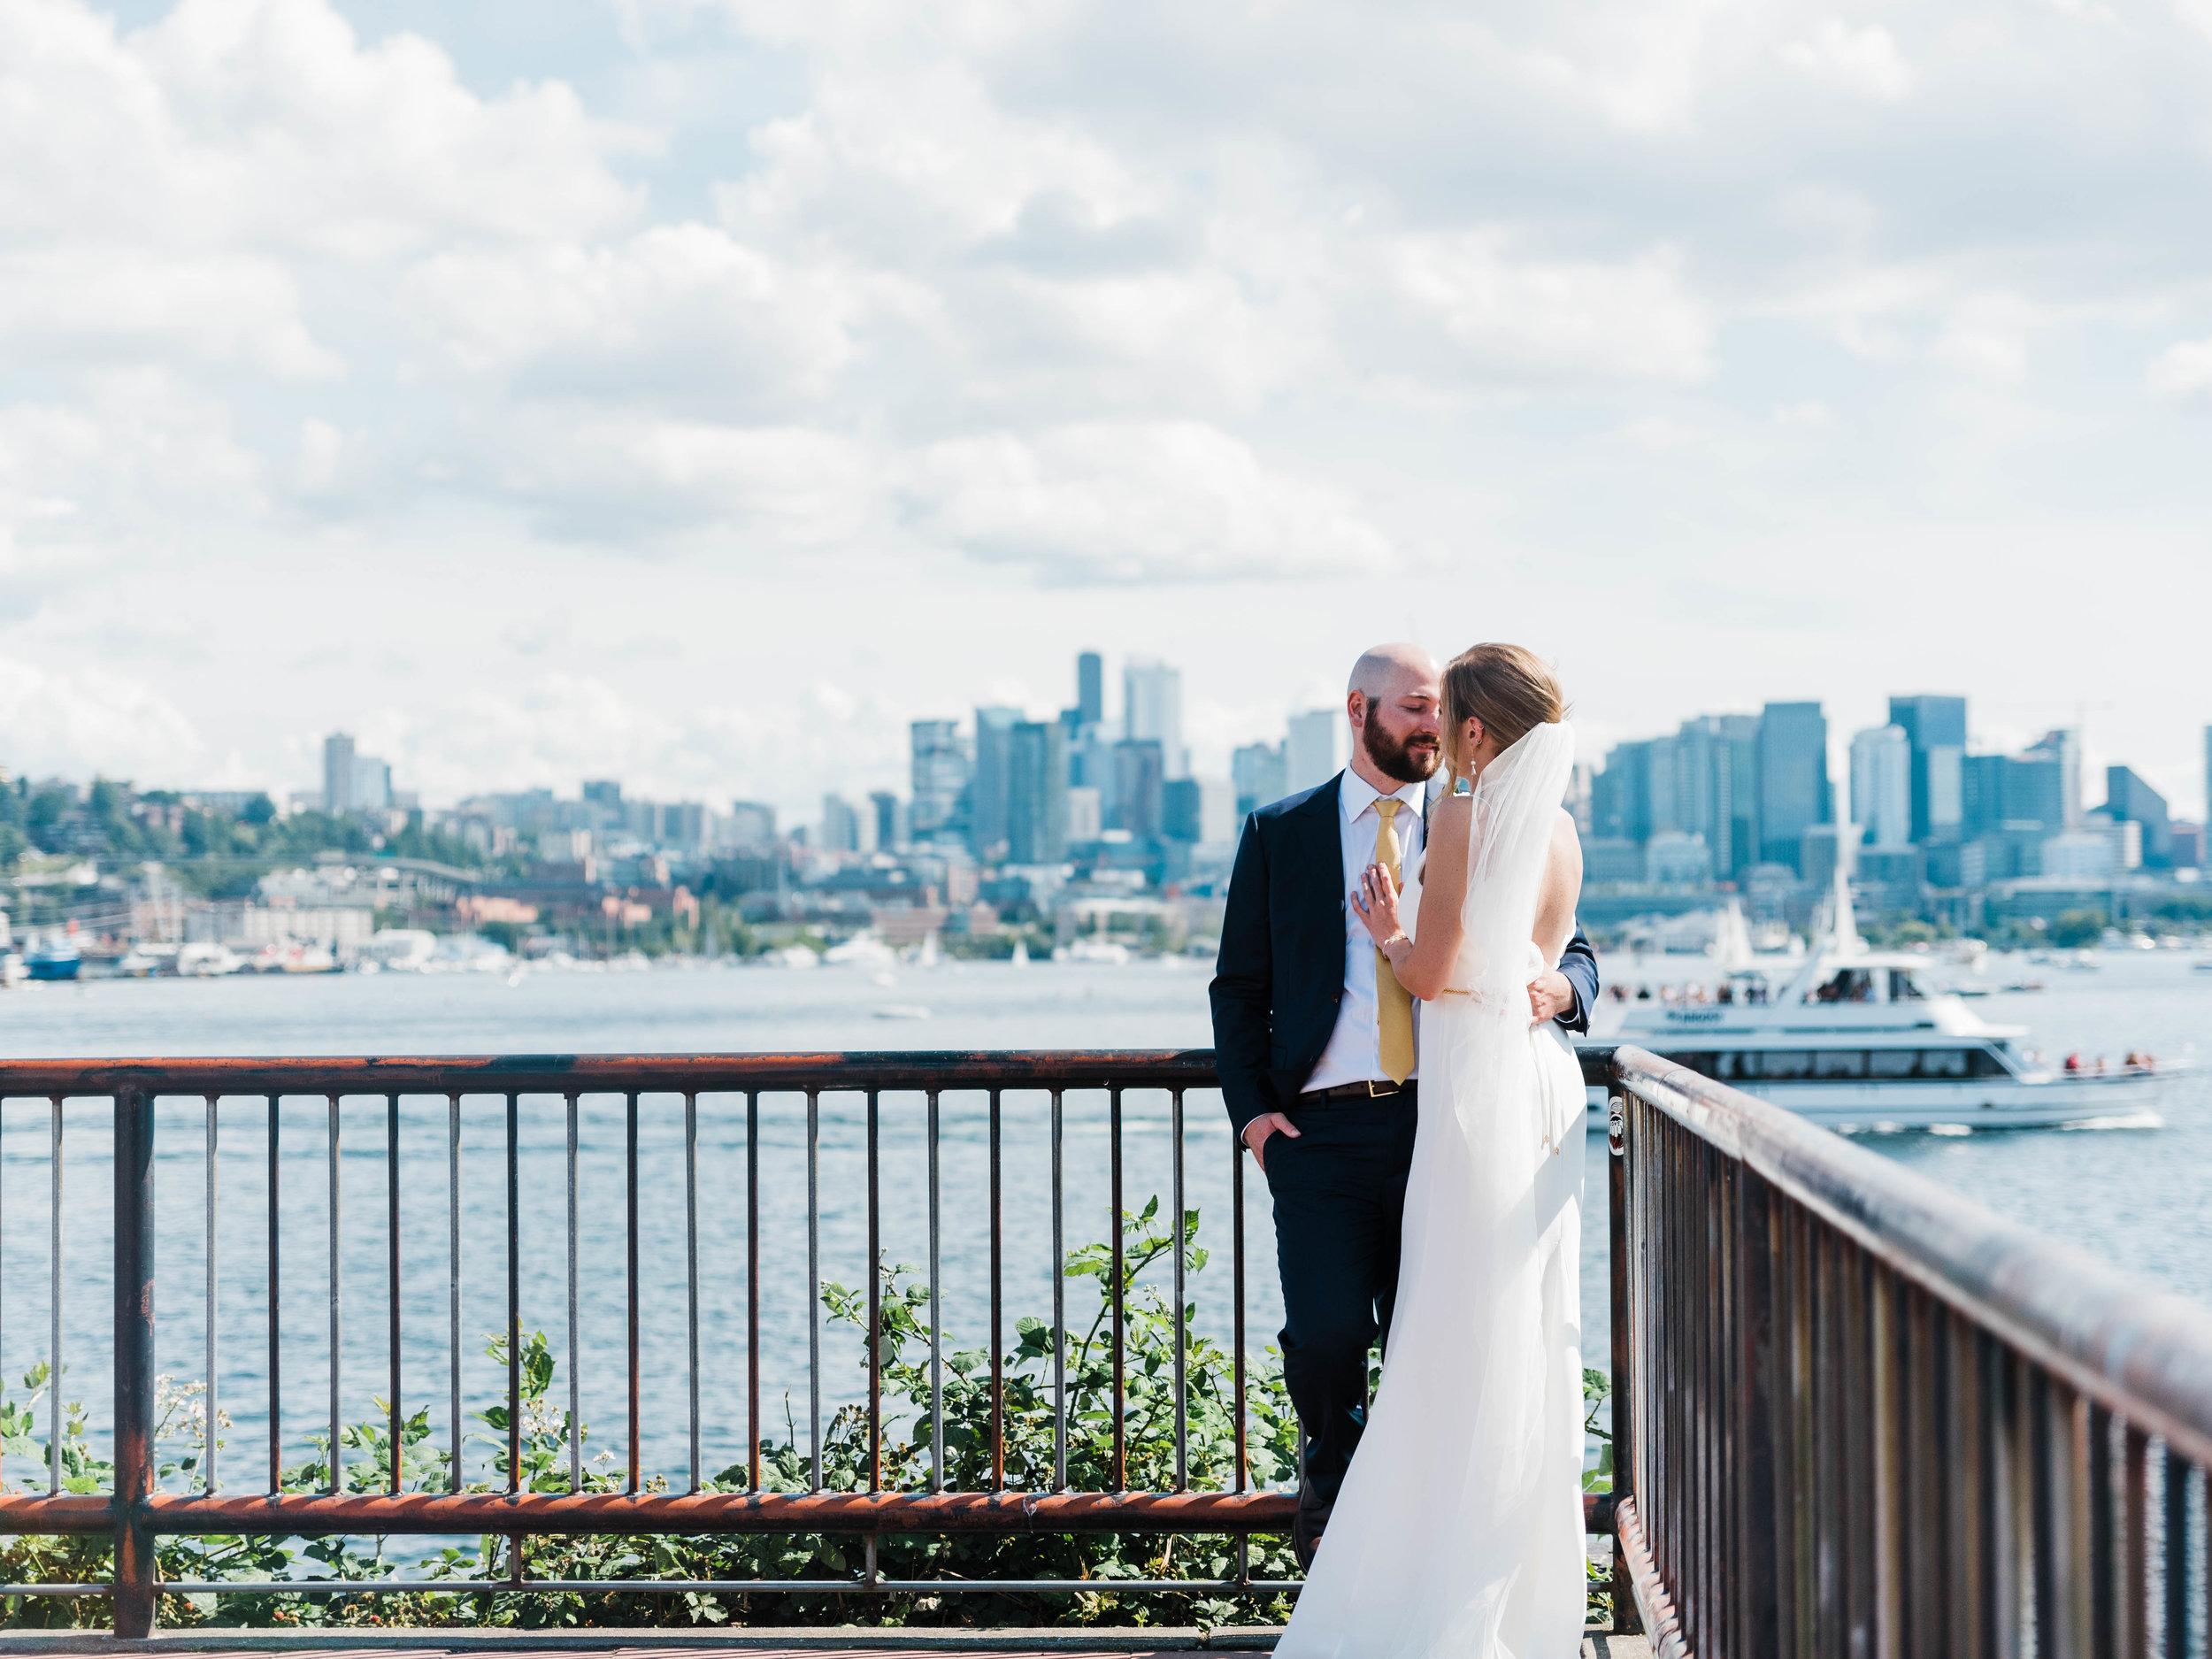 Seattle Wedding- MV Skansonia - Anna + Josh -  (924) - Copy.jpg